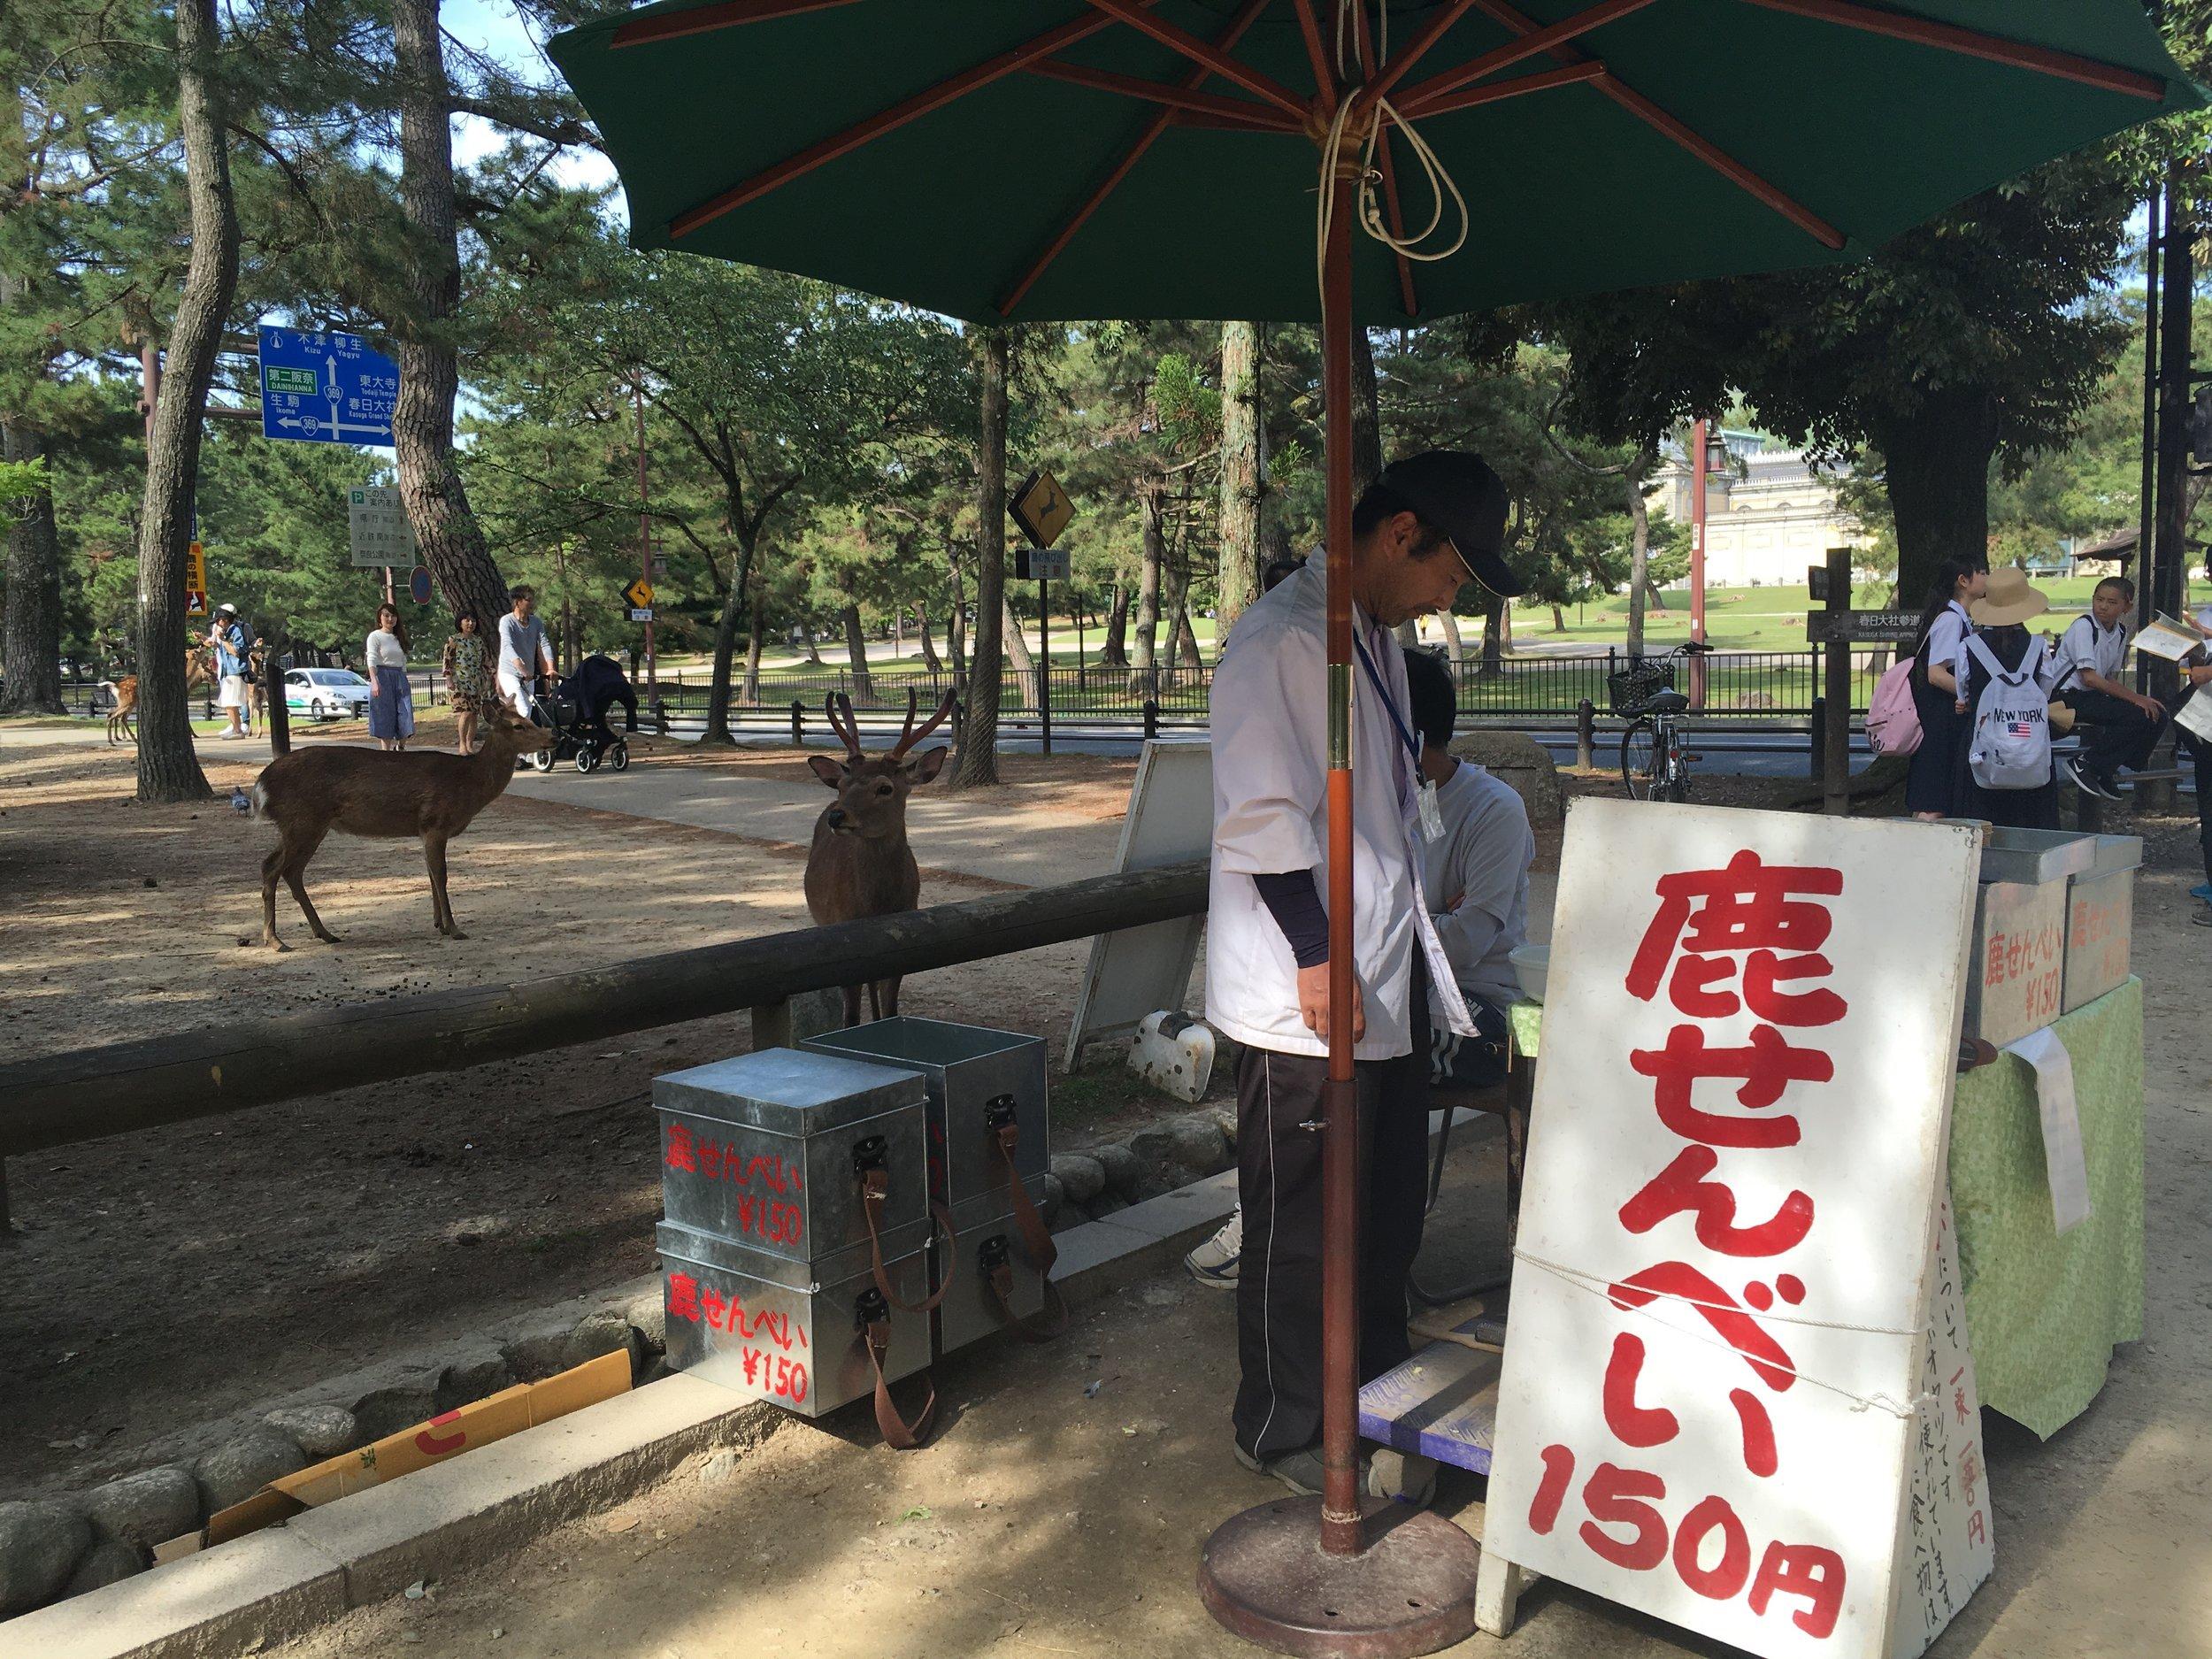 Deer Cracker stand! 150 Yen for ten!